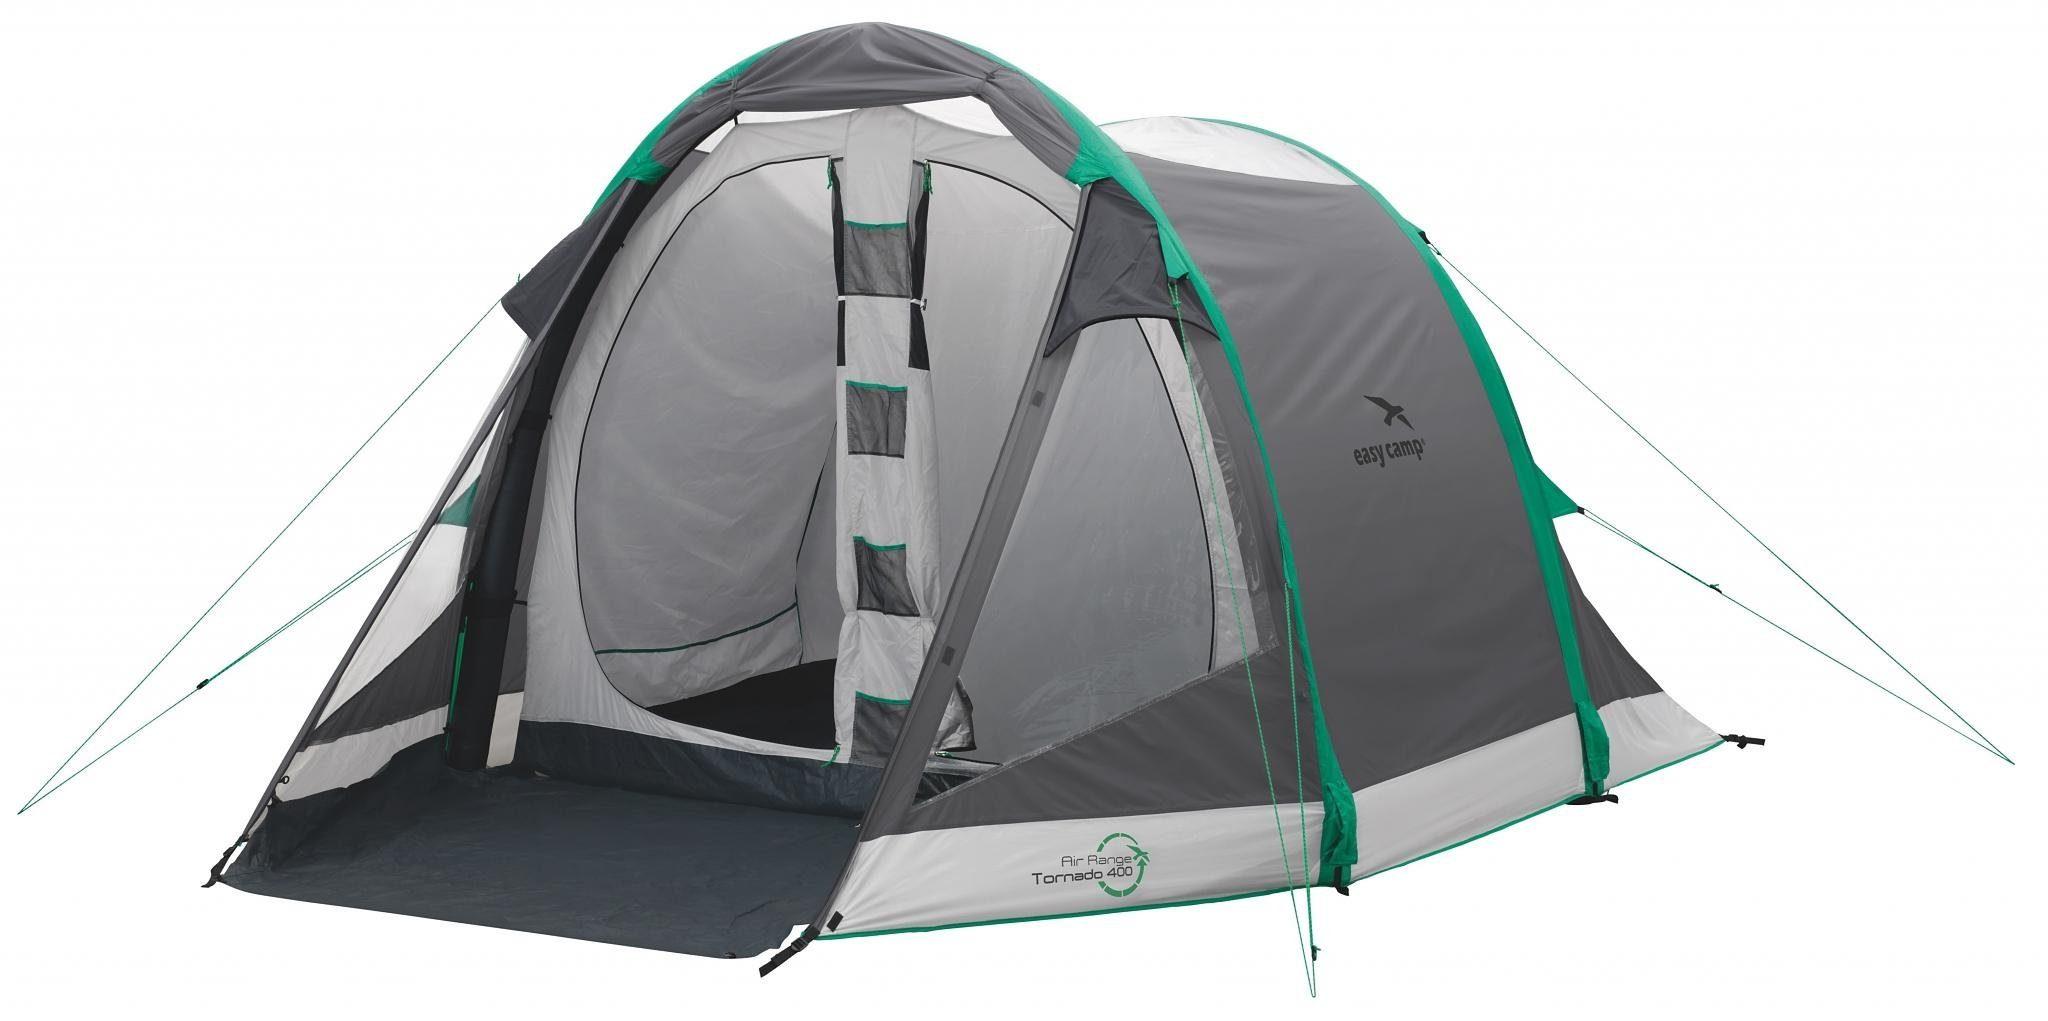 easy camp Zelt »Tornado 400 Tent«